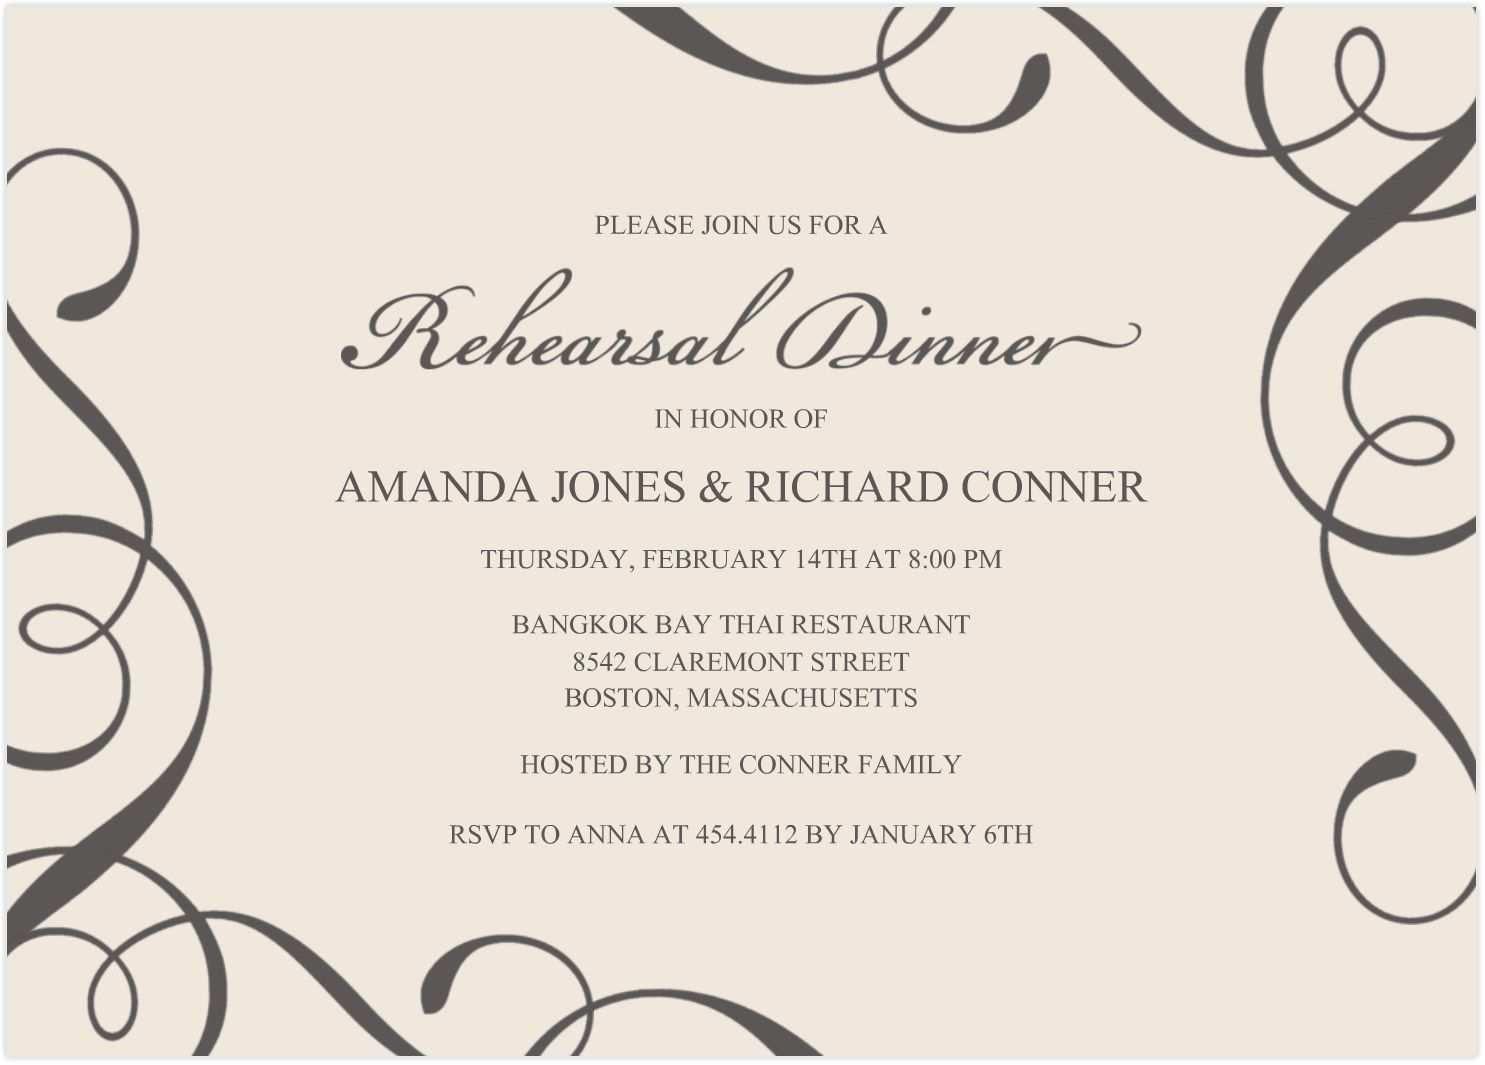 002 Unusual Free Dinner Invitation Template Picture  Templates Rehearsal Printable Italian ThanksgivingFull